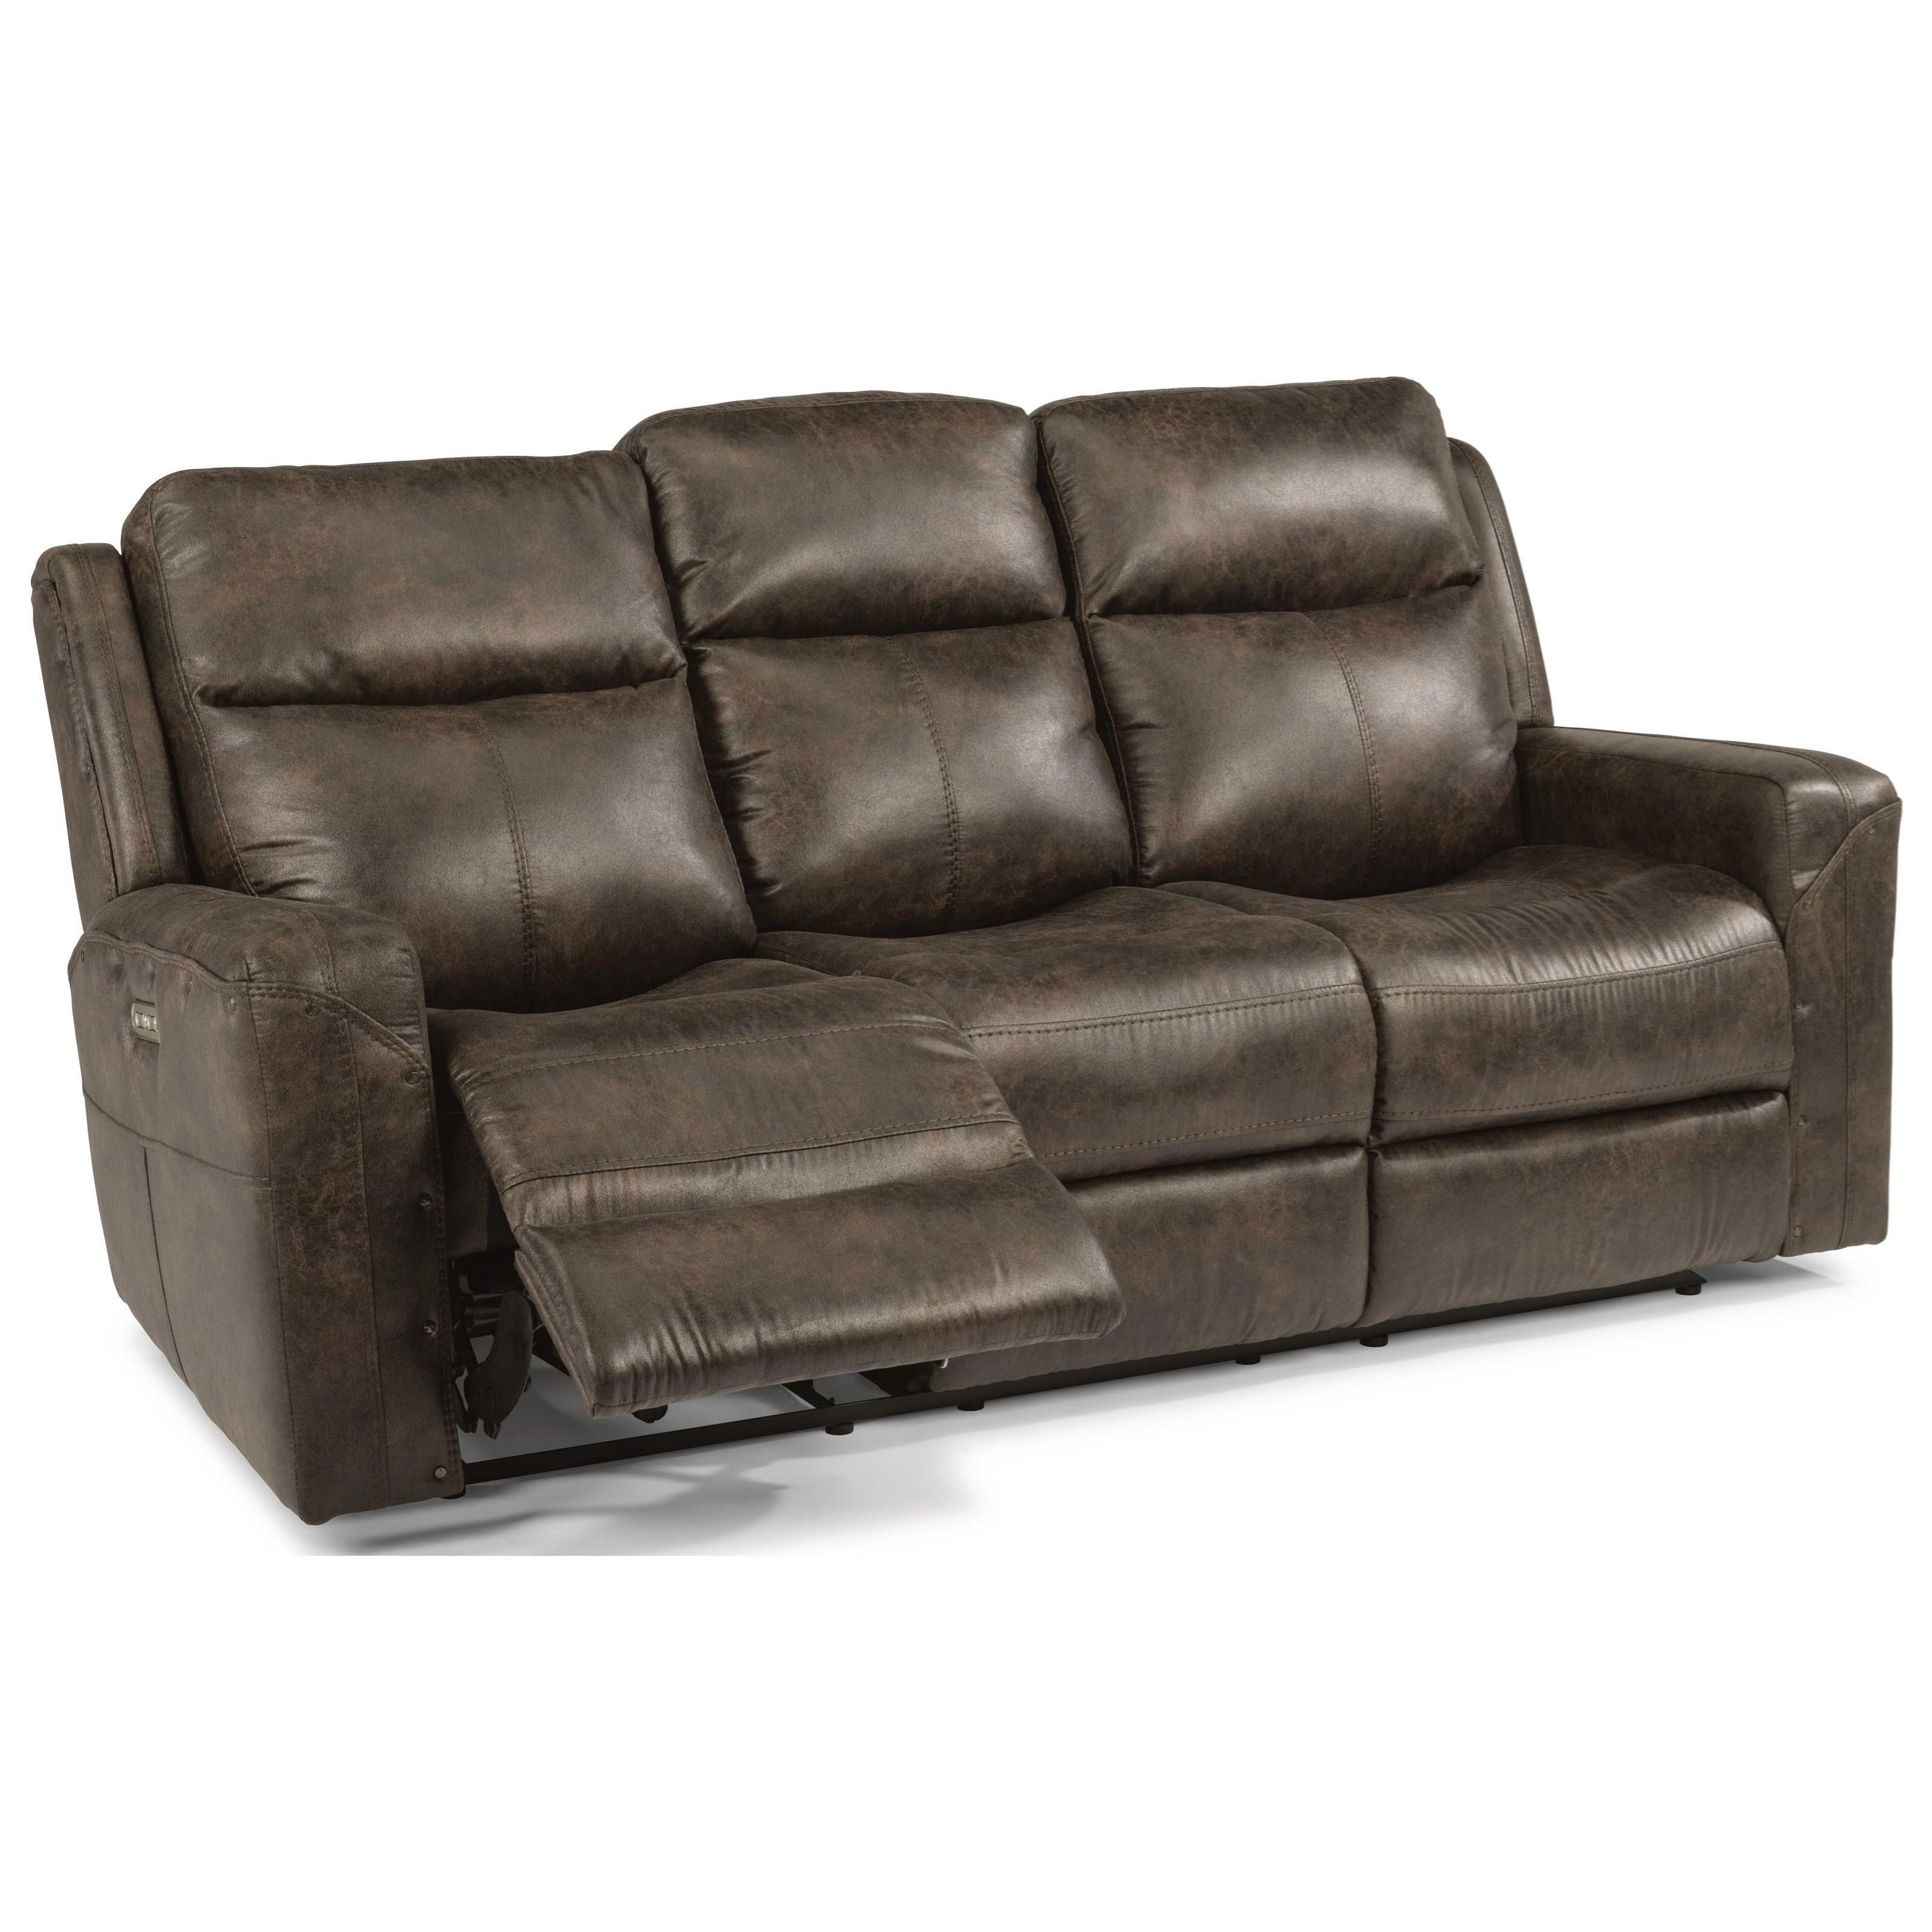 Flexsteel Furniture Uk: Gunner 1766-62PH Power Reclining